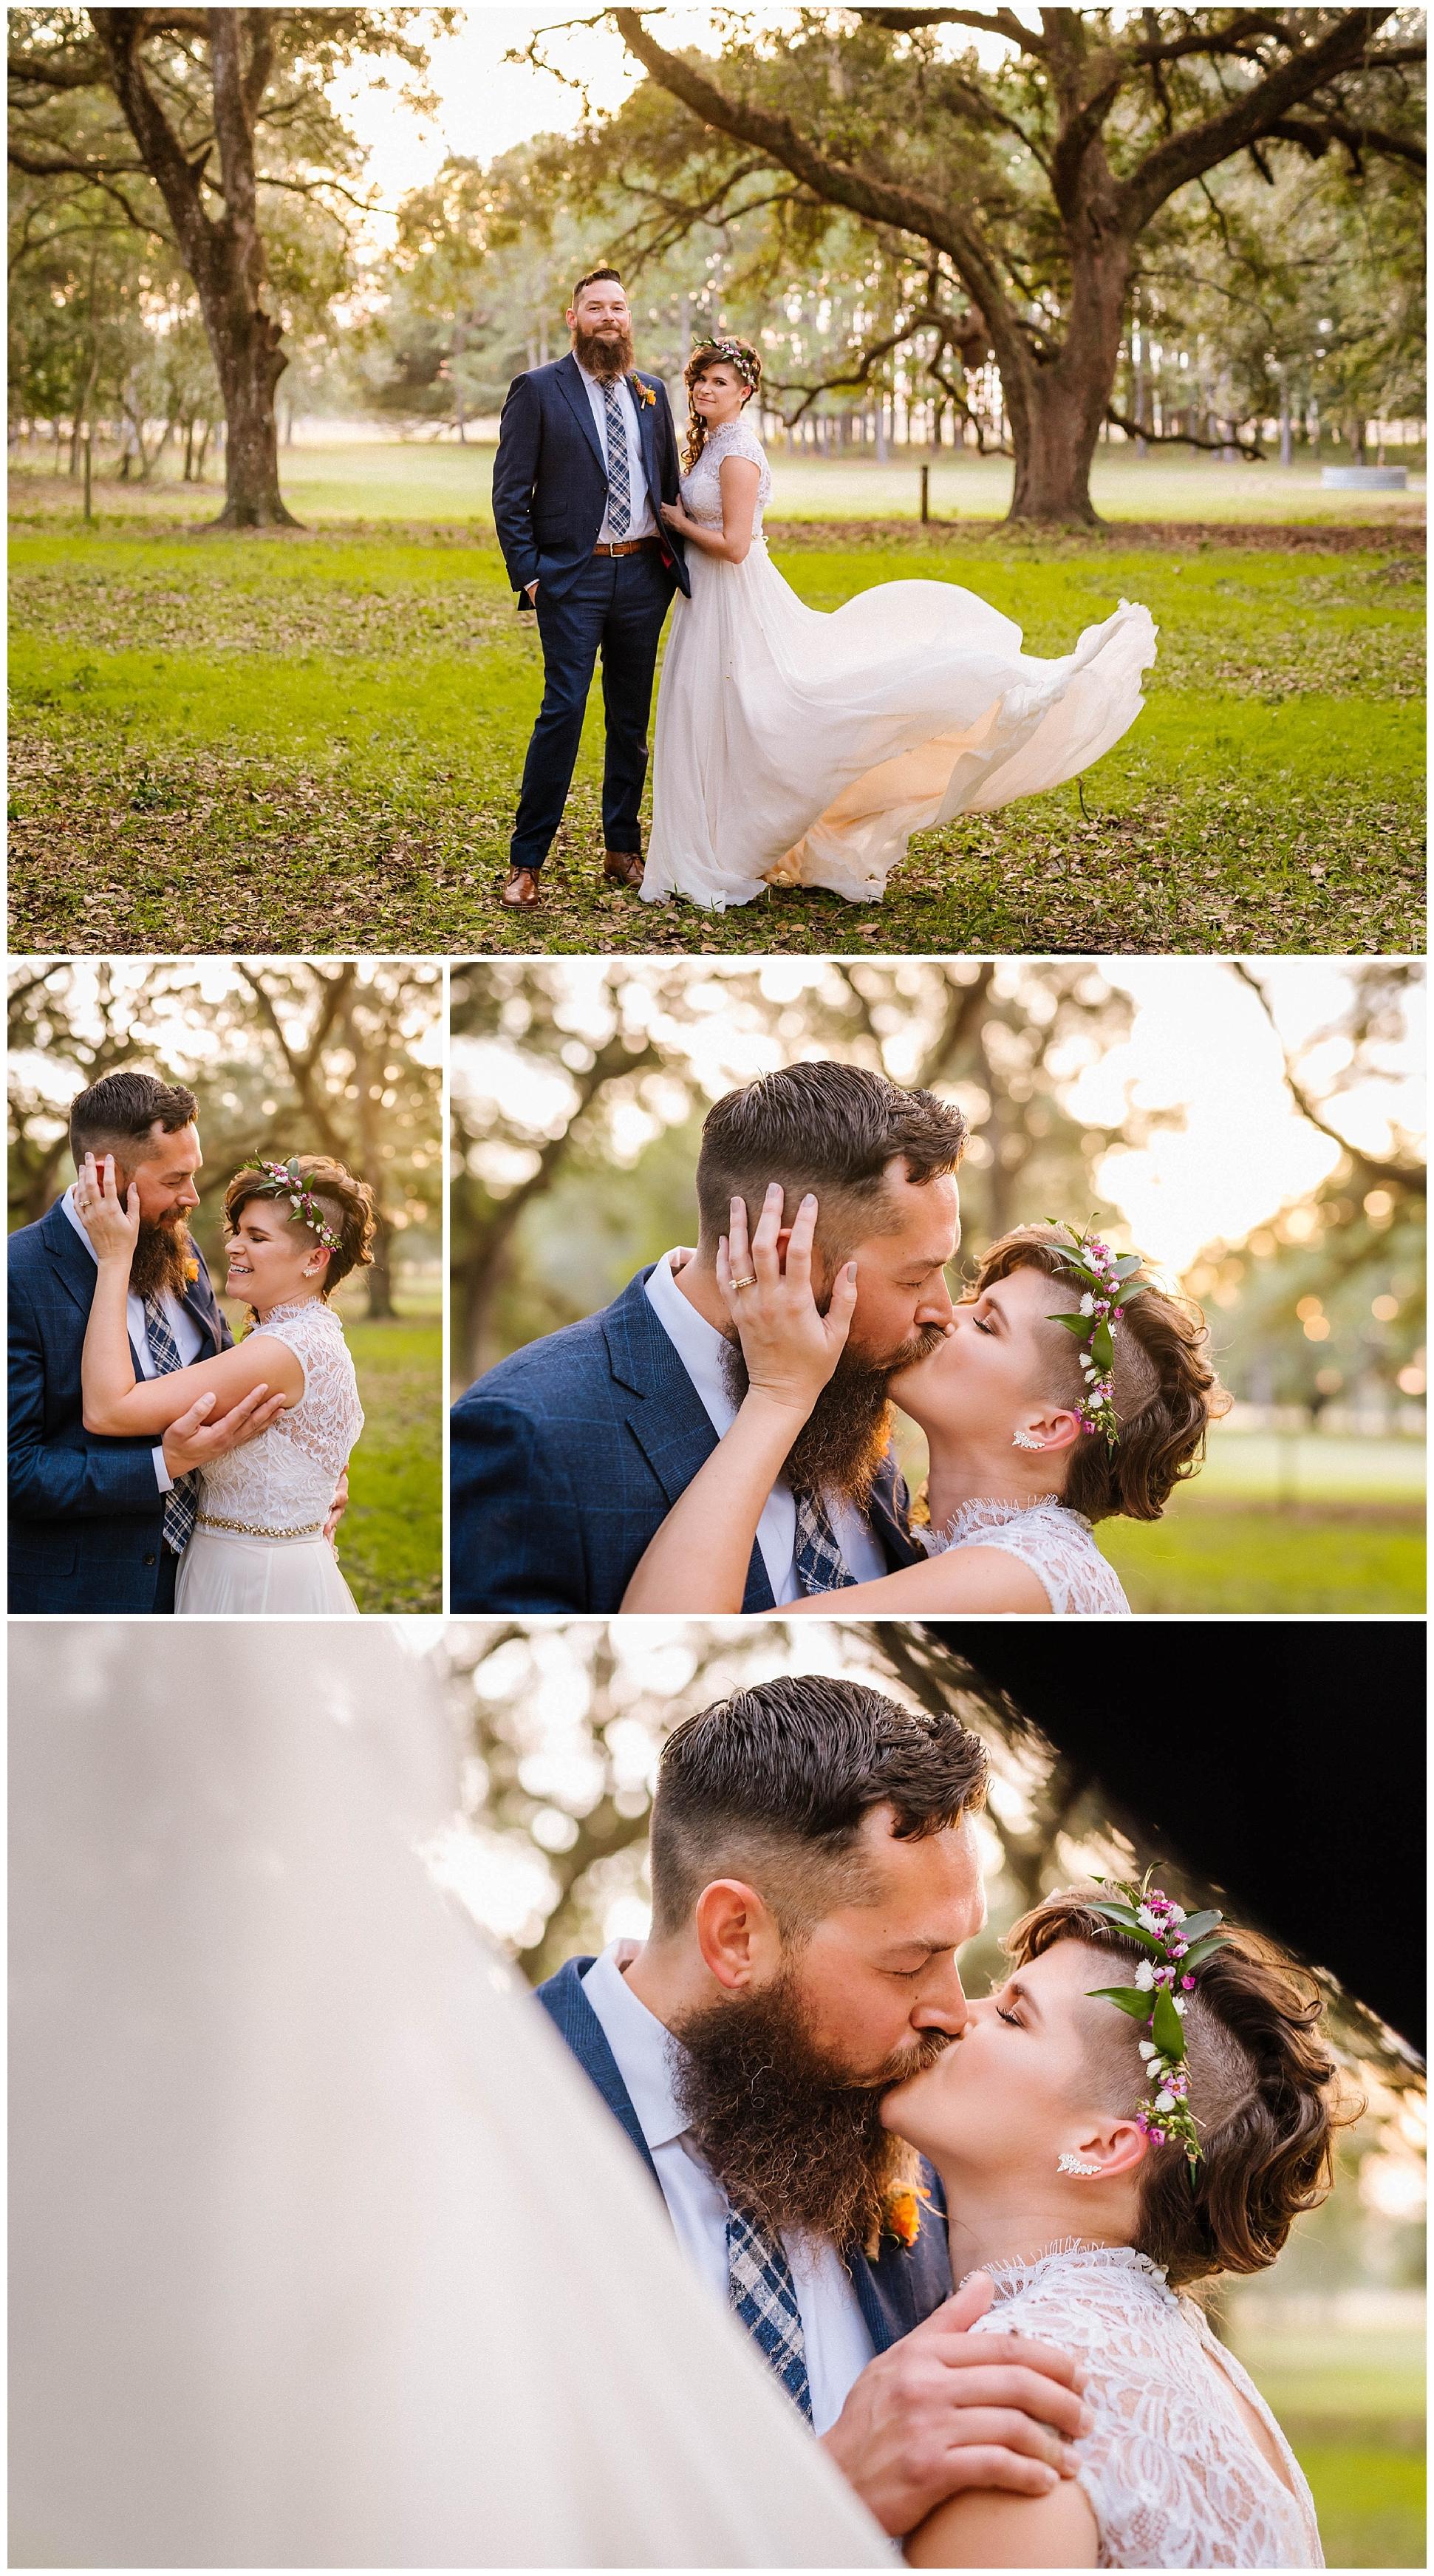 magical-outdoor-florida-wedding-smoke-bombs-flowers-crown-beard_0046.jpg